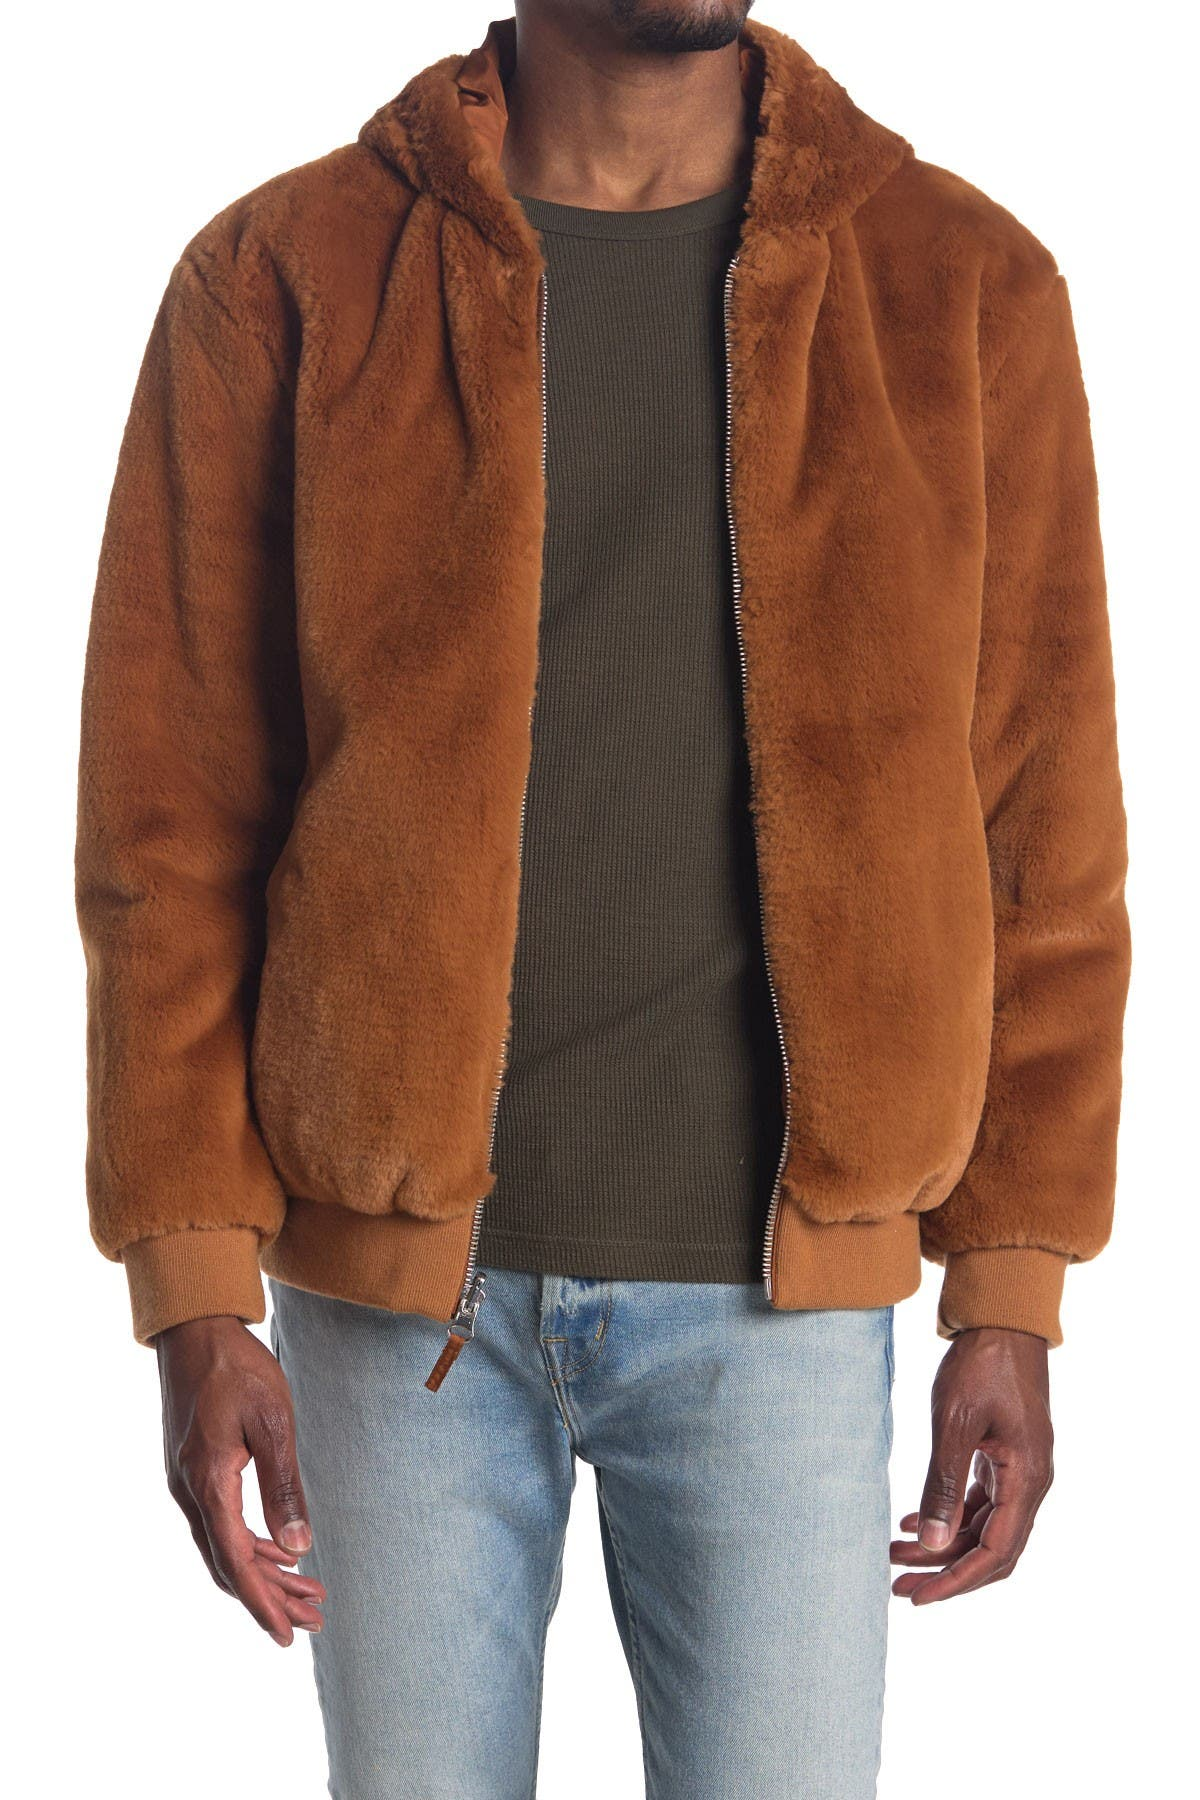 Image of Sean John Faux Shearling Zip Jacket